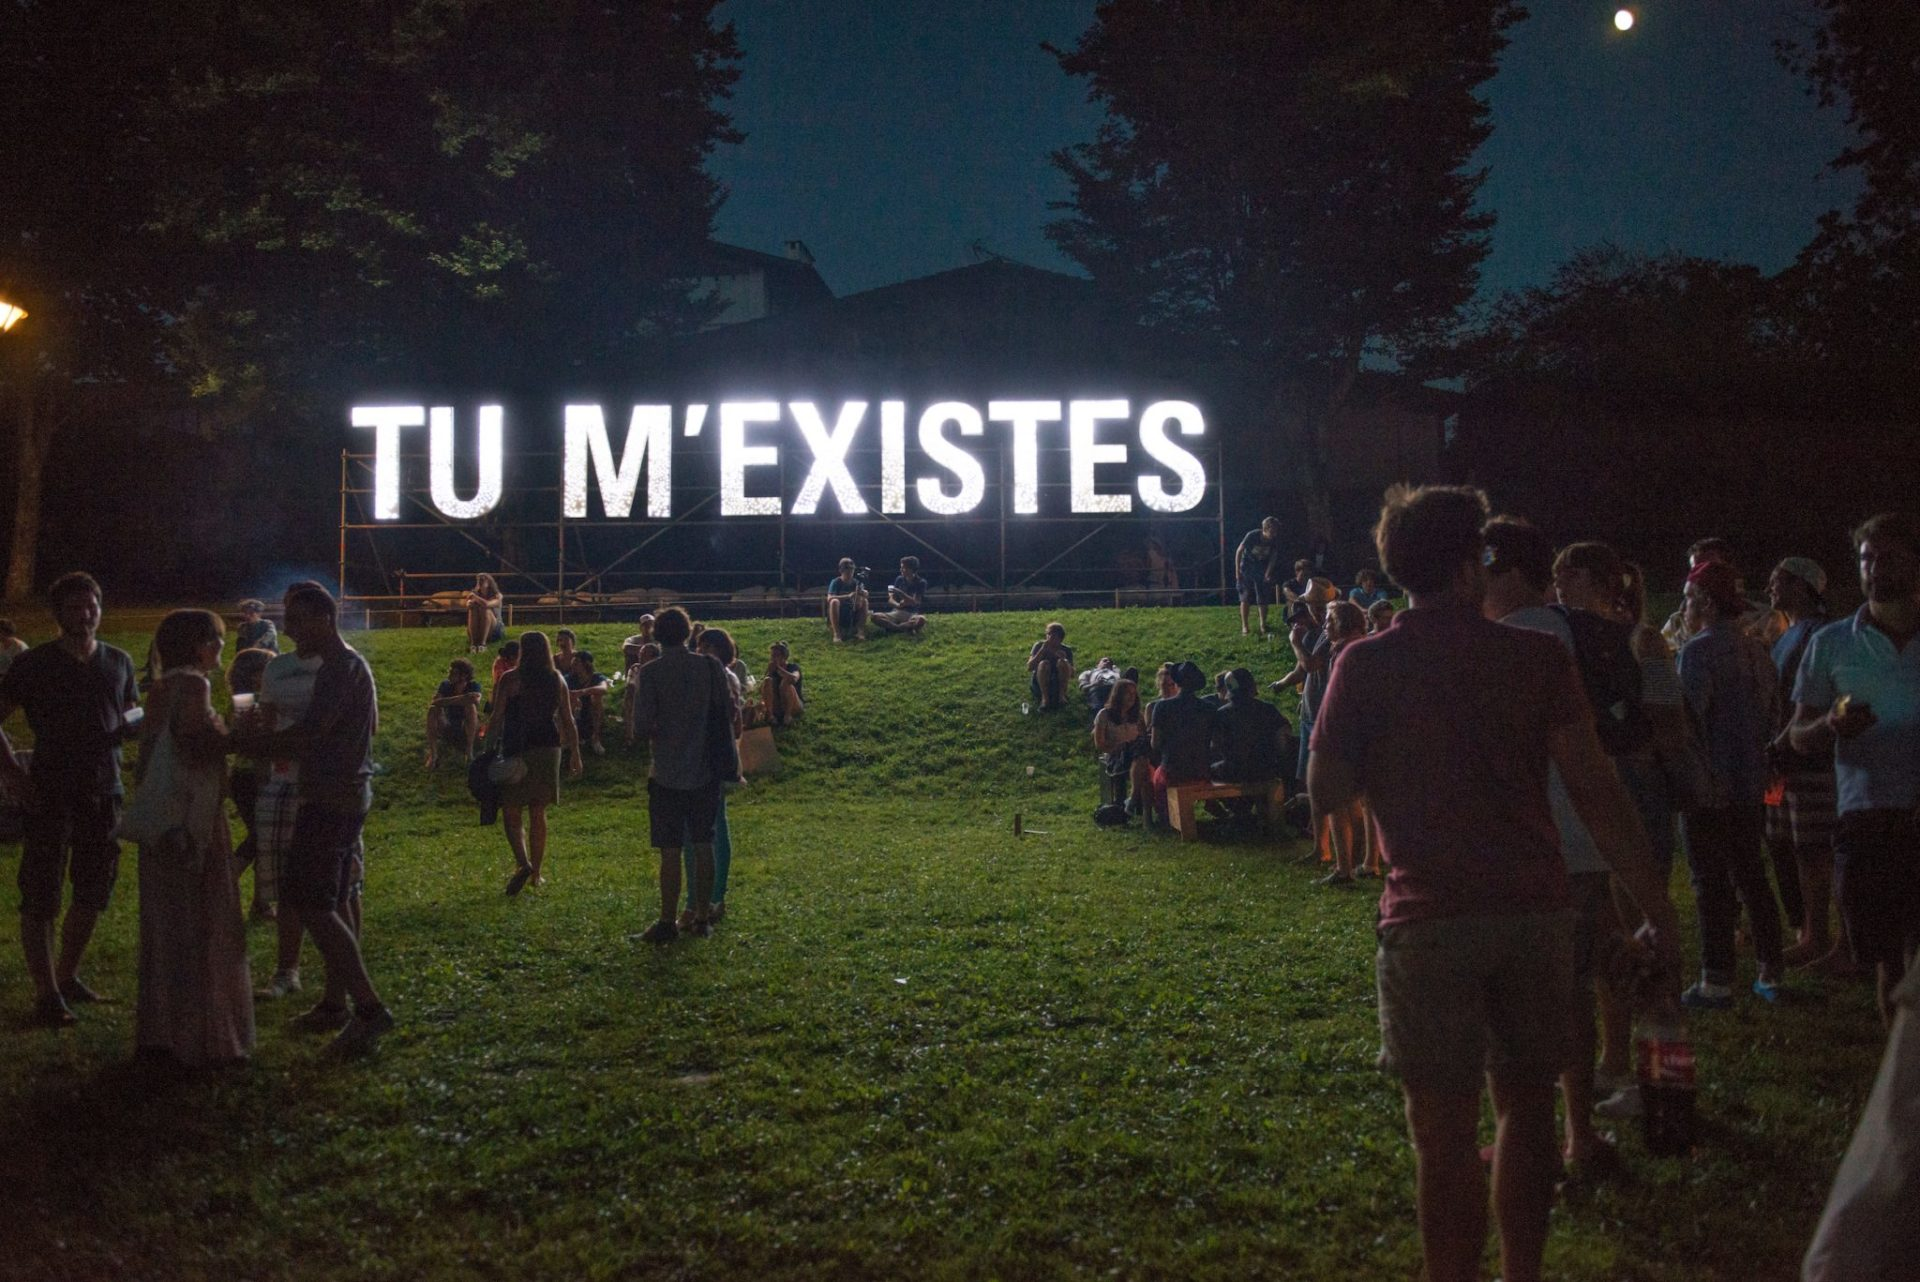 Manifesto XXI